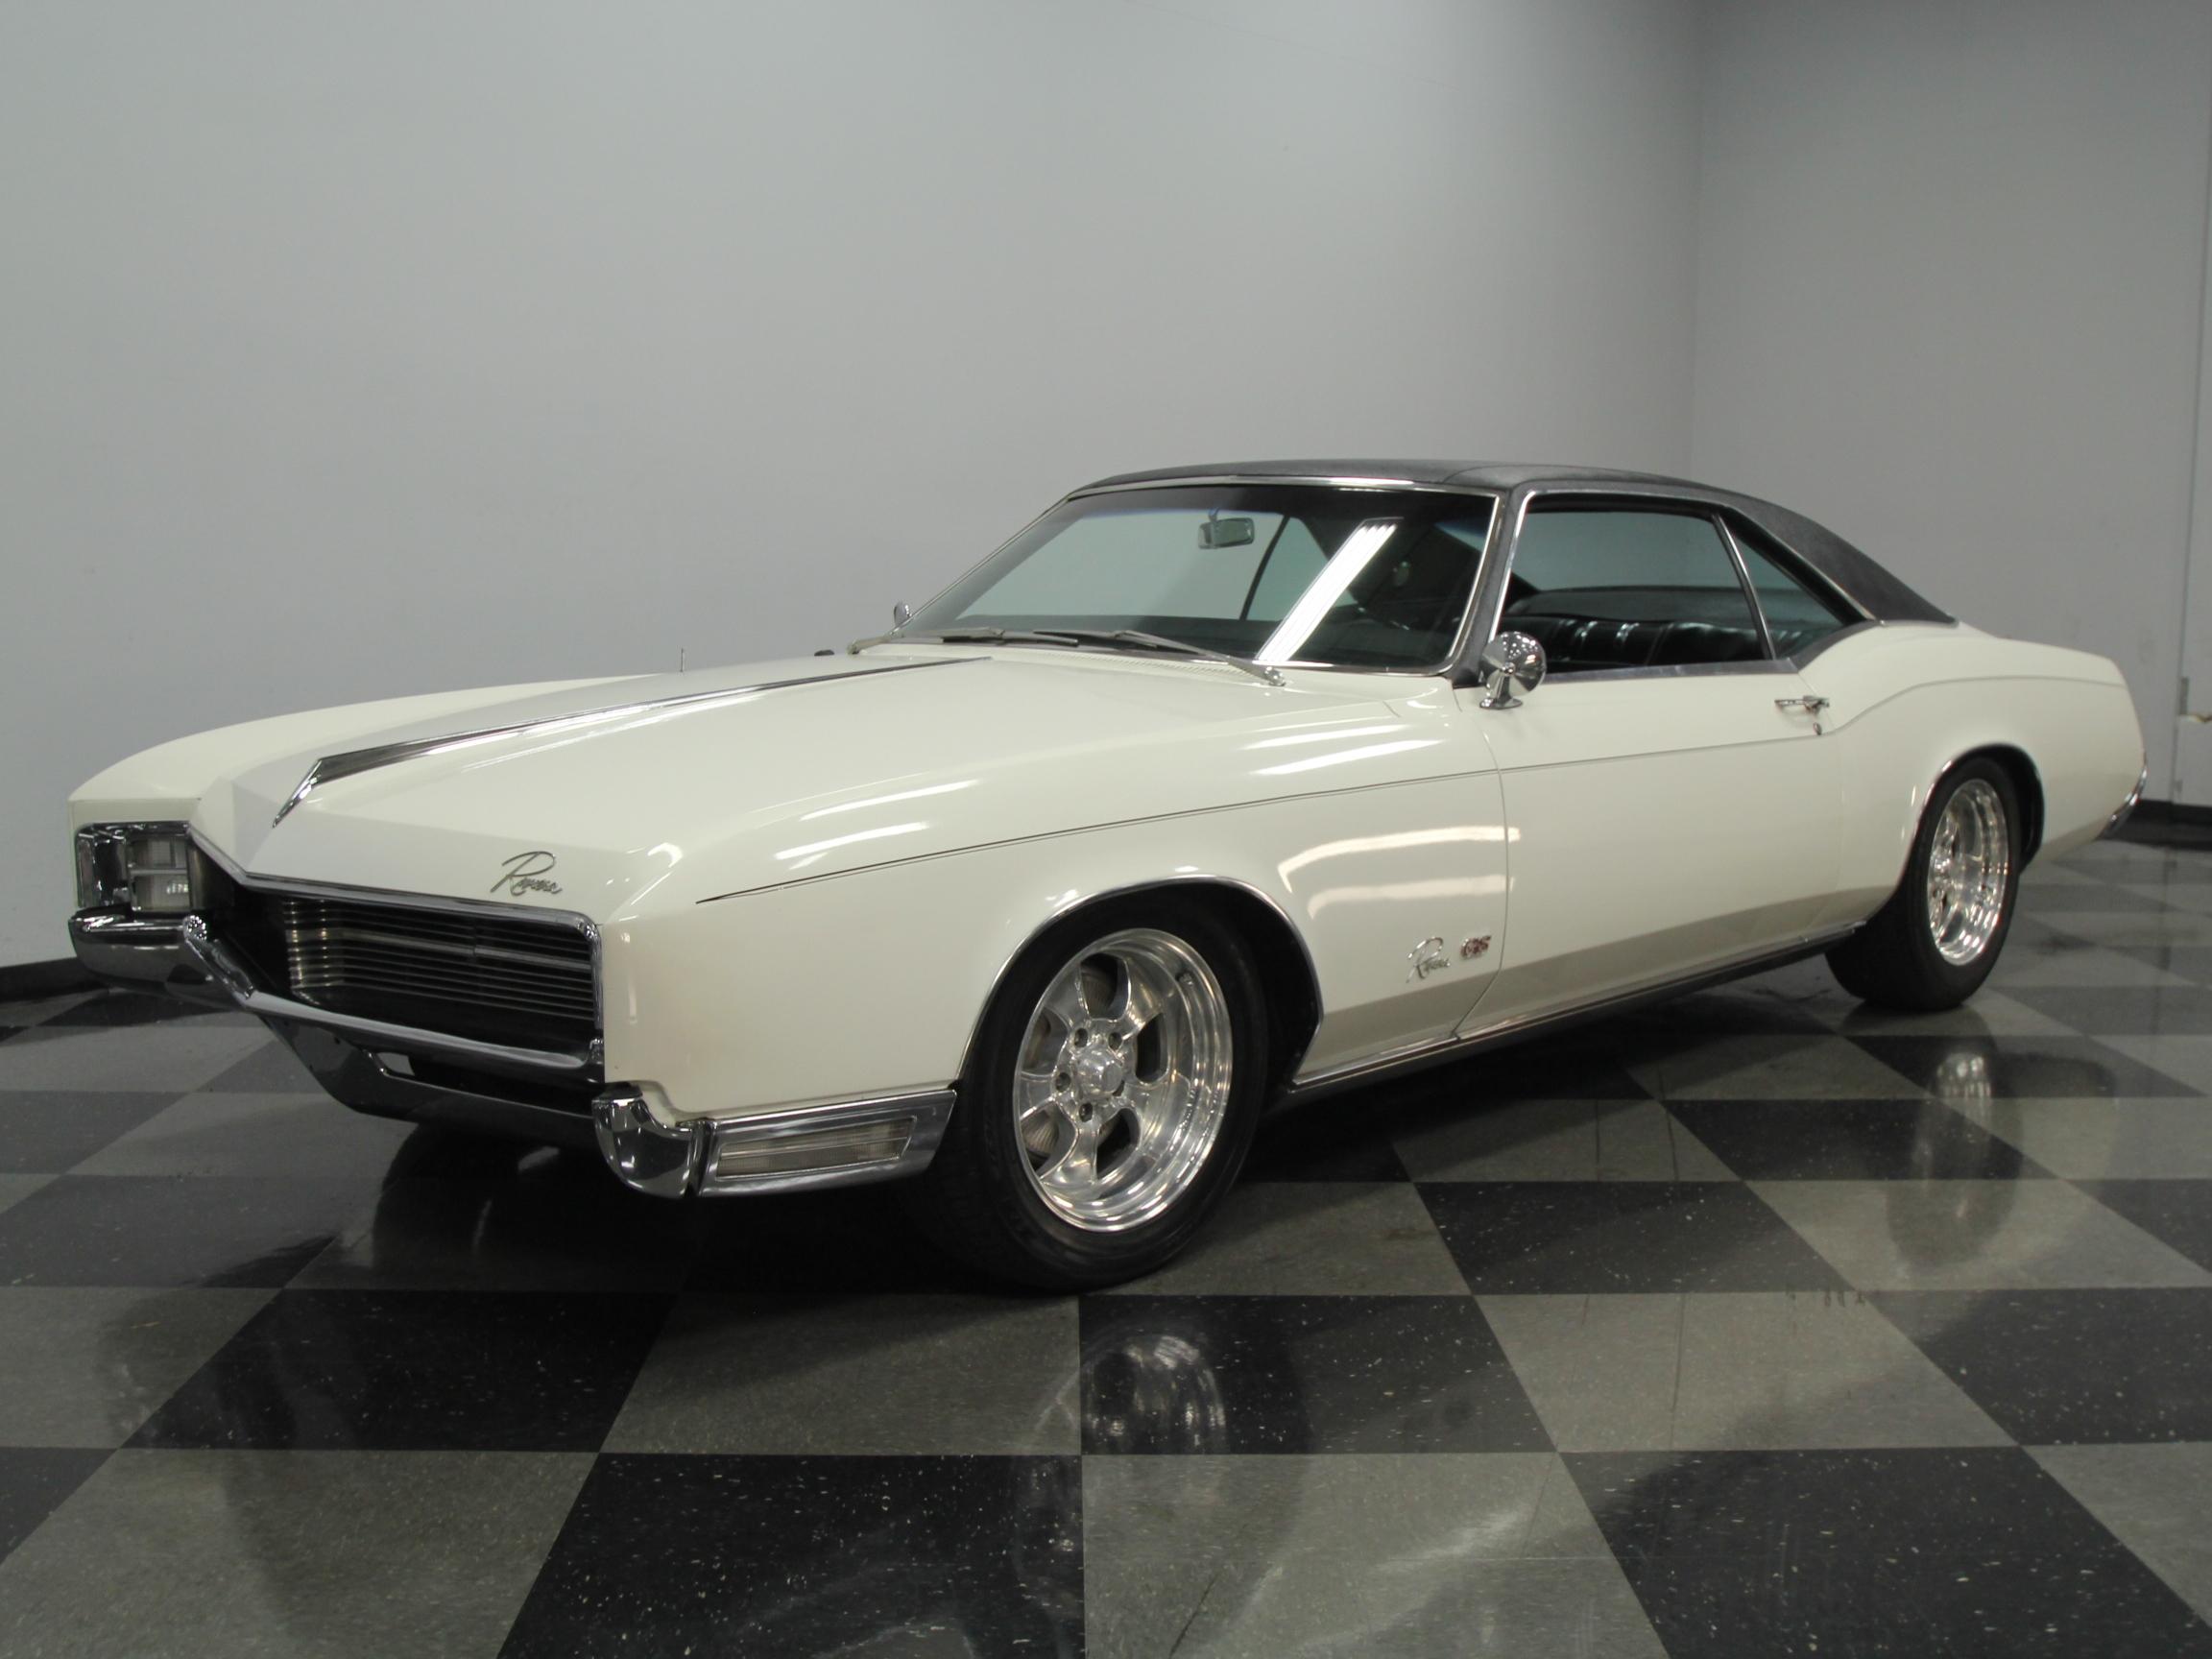 1967 Buick Riviera Gs For Sale Craigslist  SMT Car Models 1